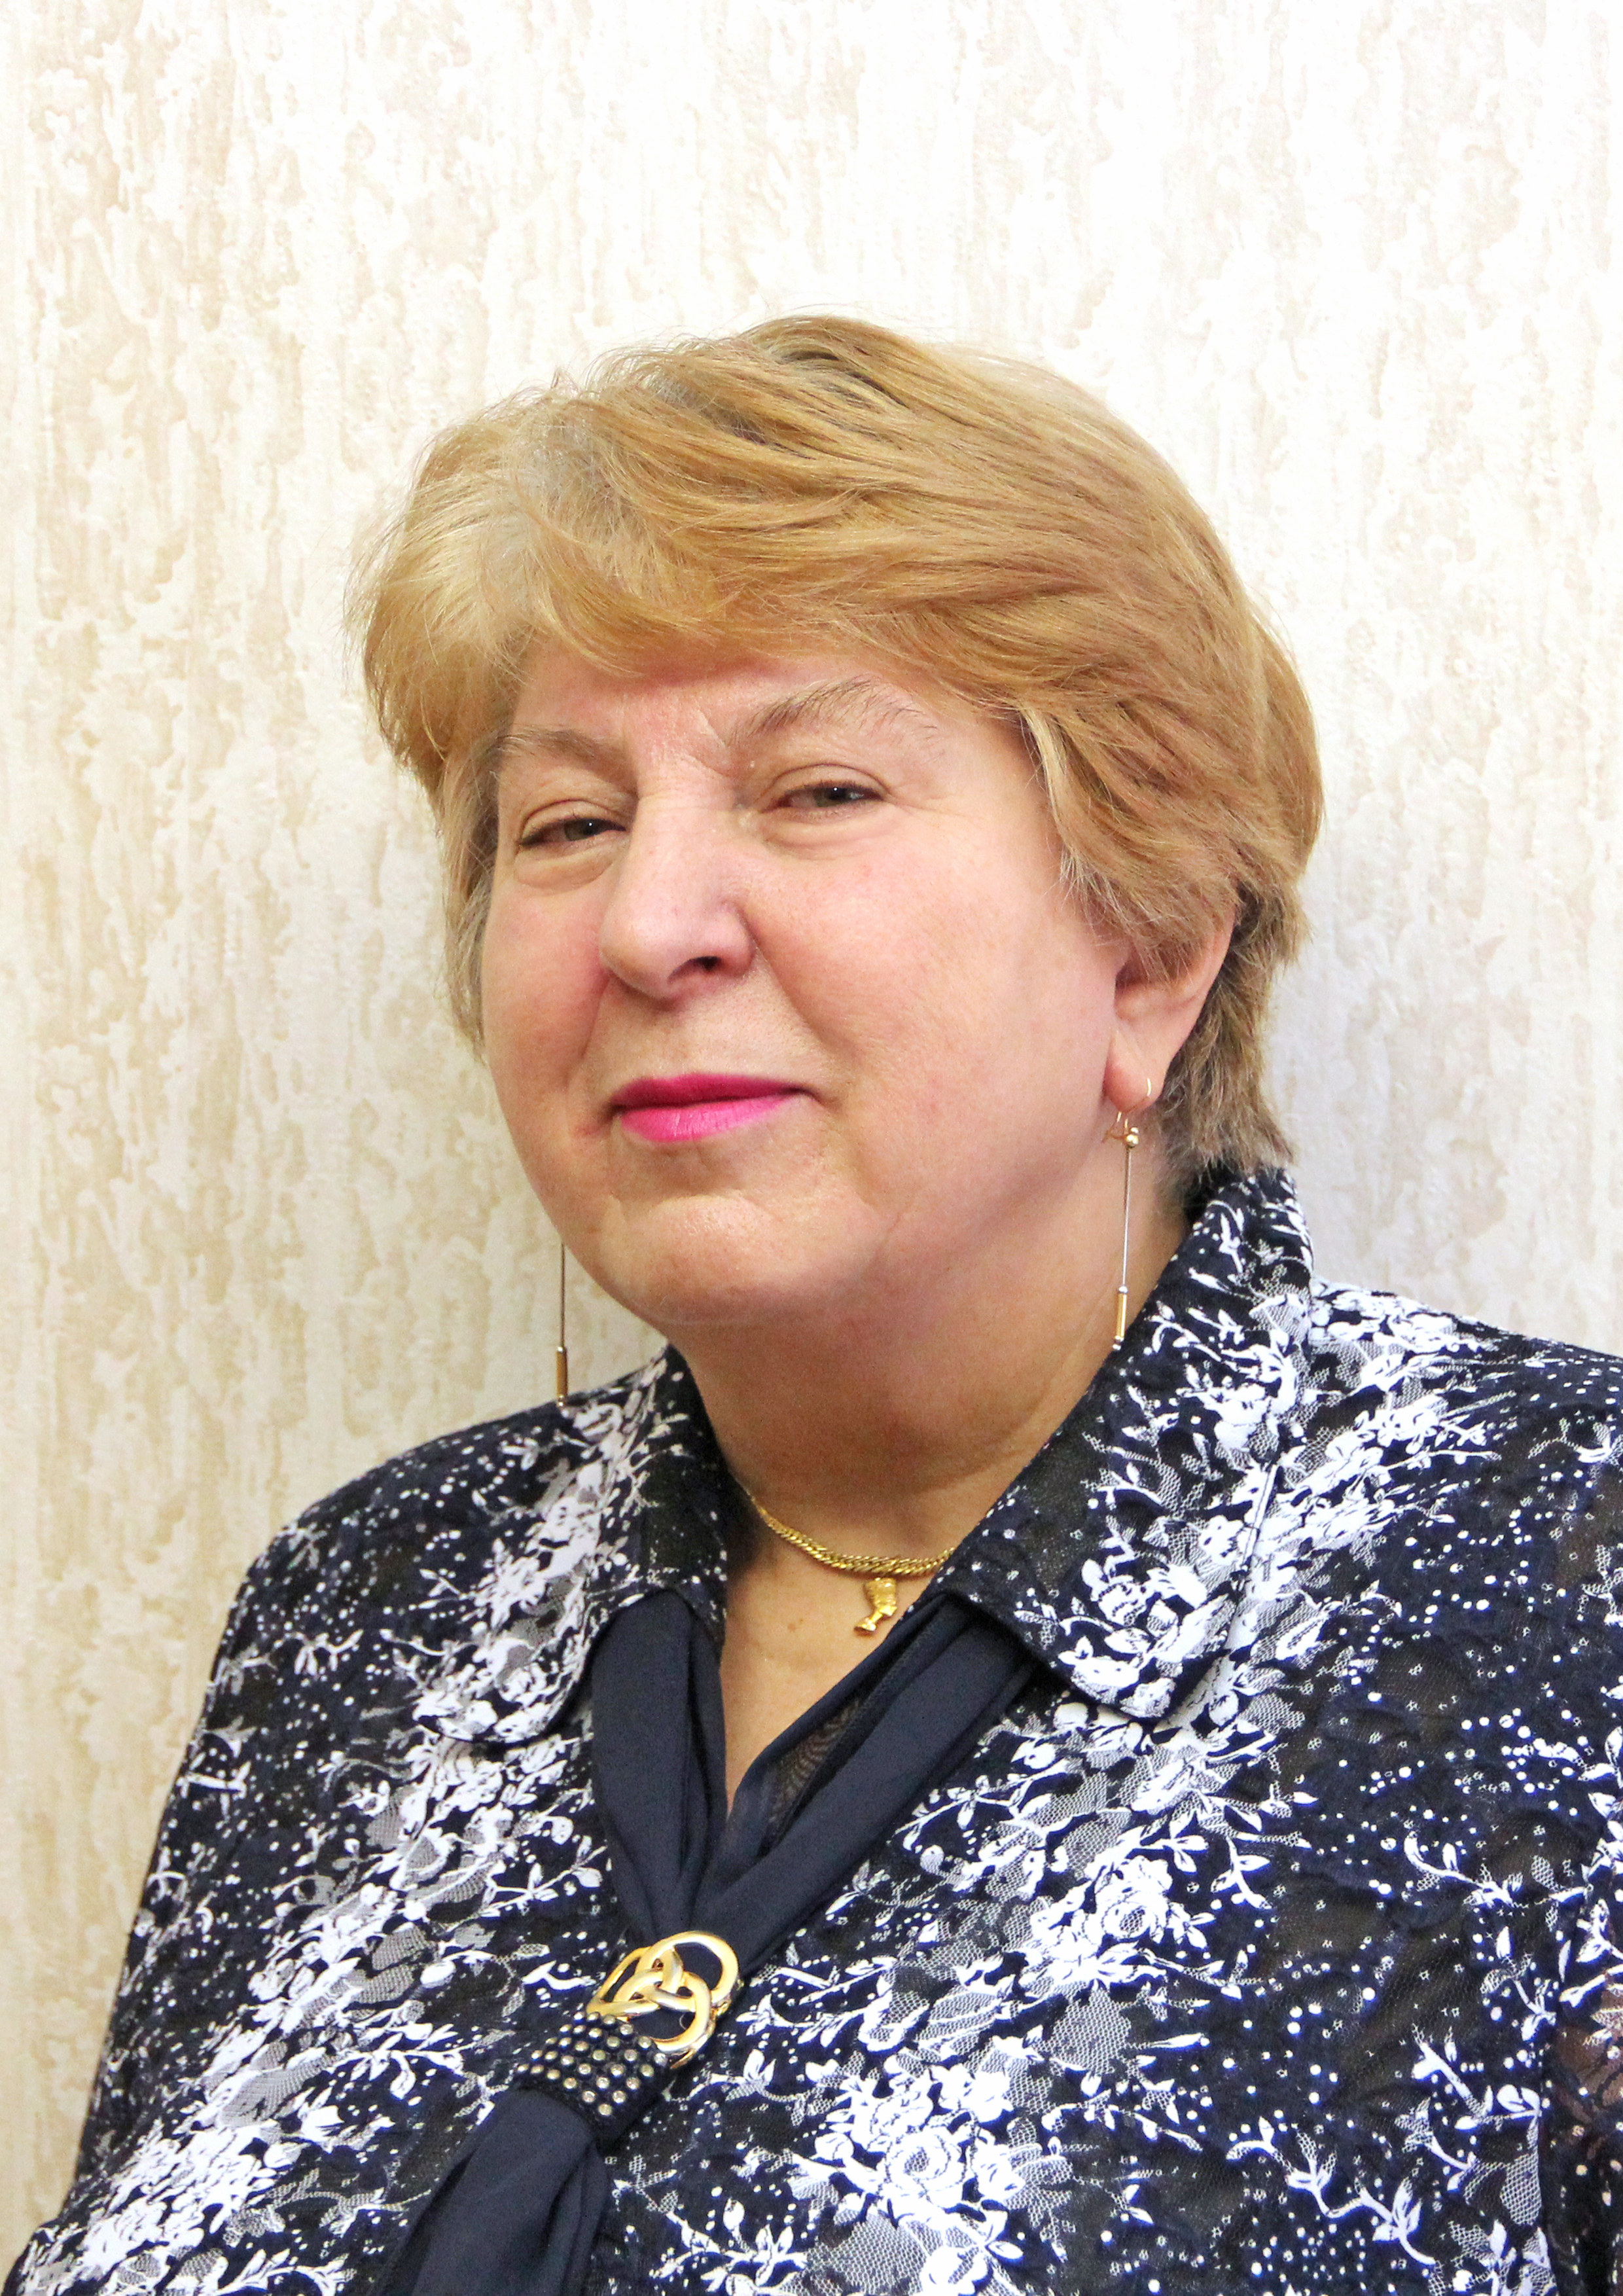 Марина Валерьяновна Королёва